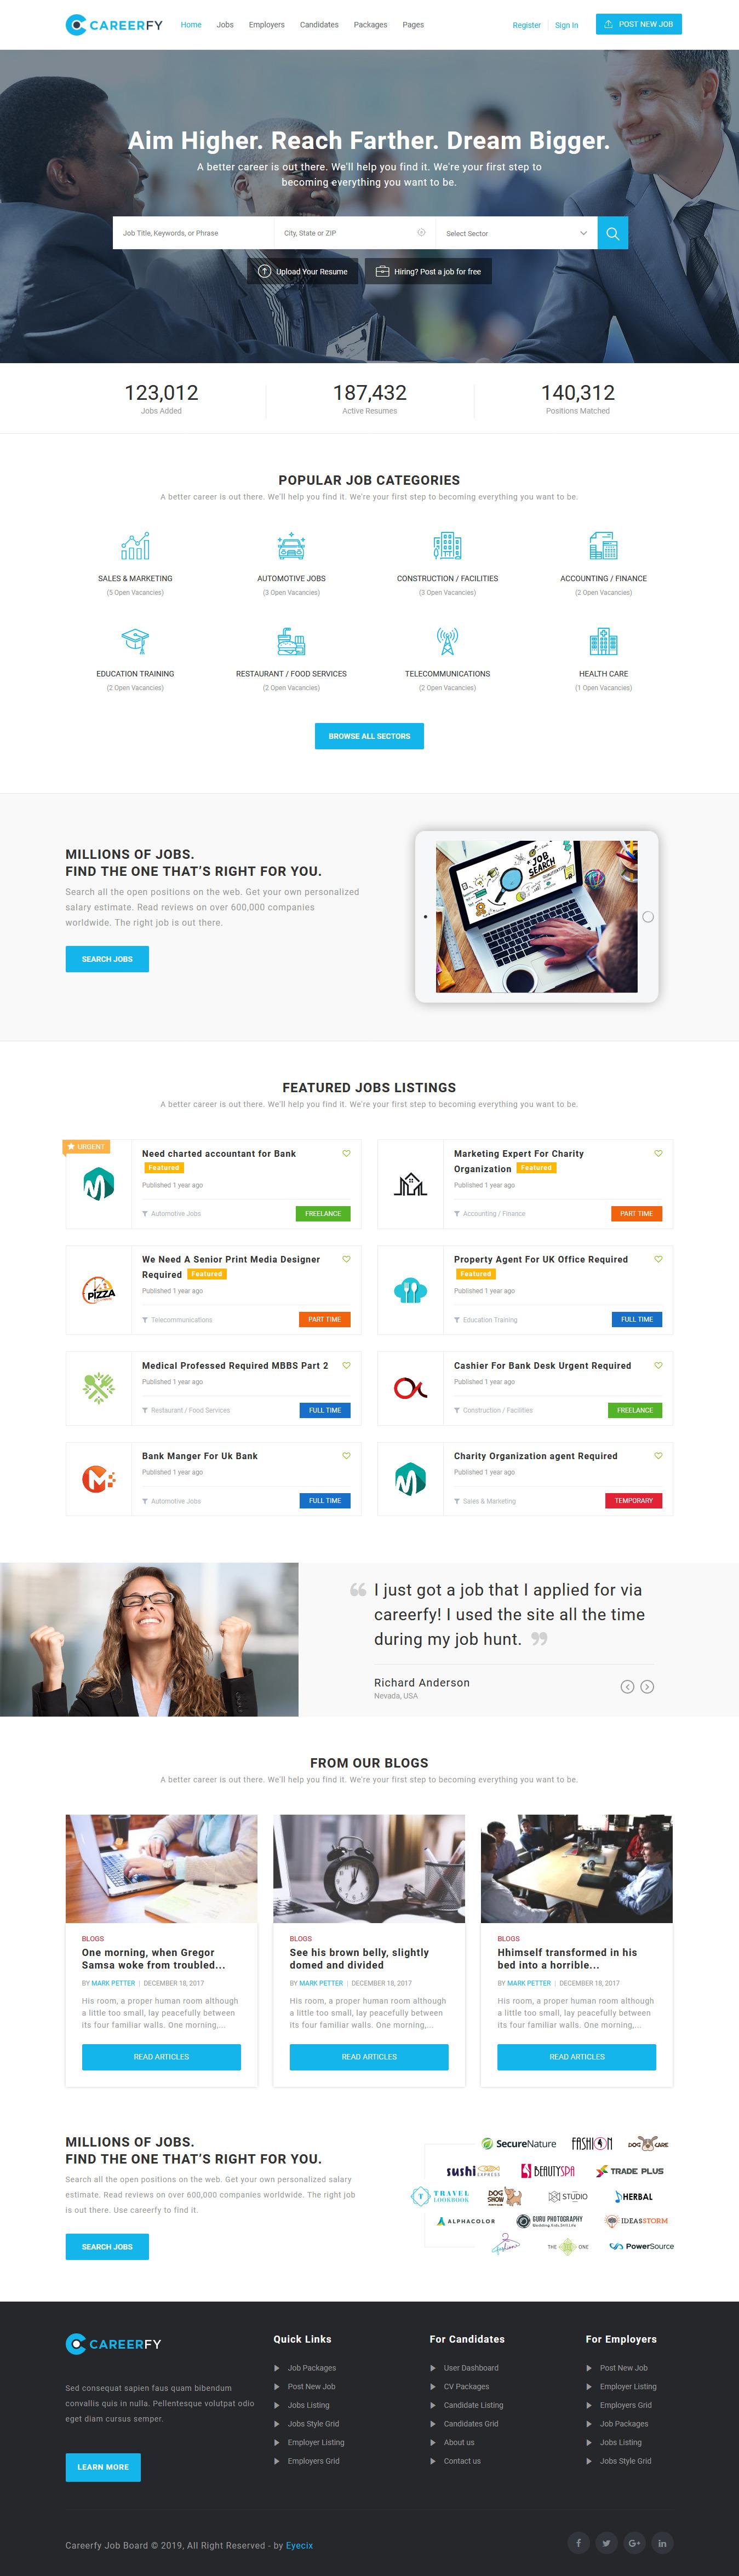 careerfy best premium job board wordpress theme 1 - 10+ Best Premium Job Board WordPress Themes